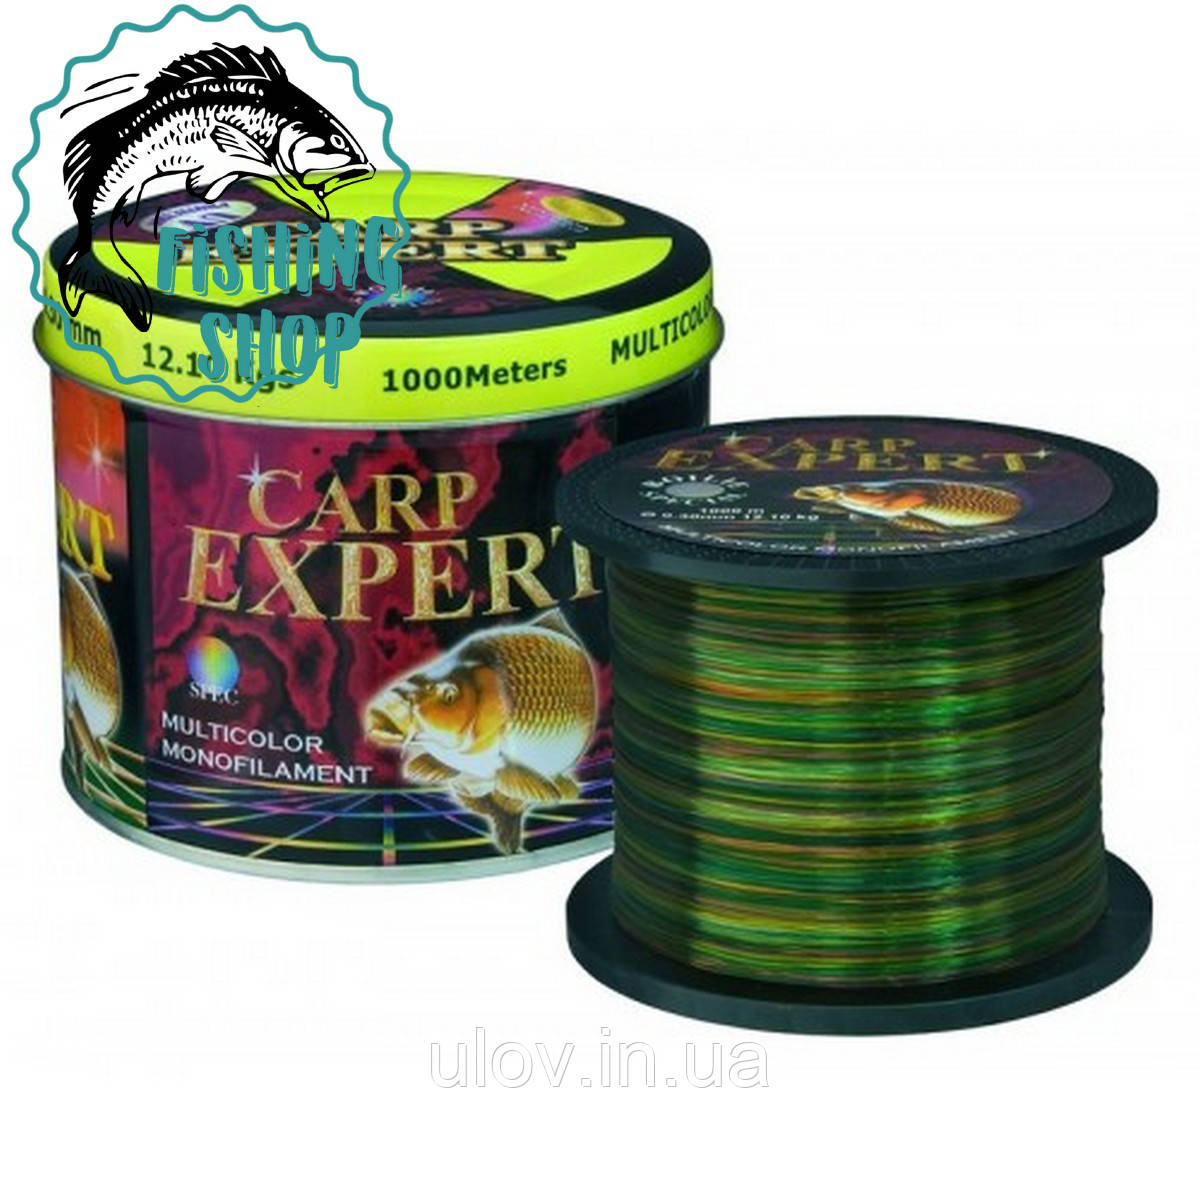 Леска рыболовная Carp Expert Multicolor 1000m 0.35